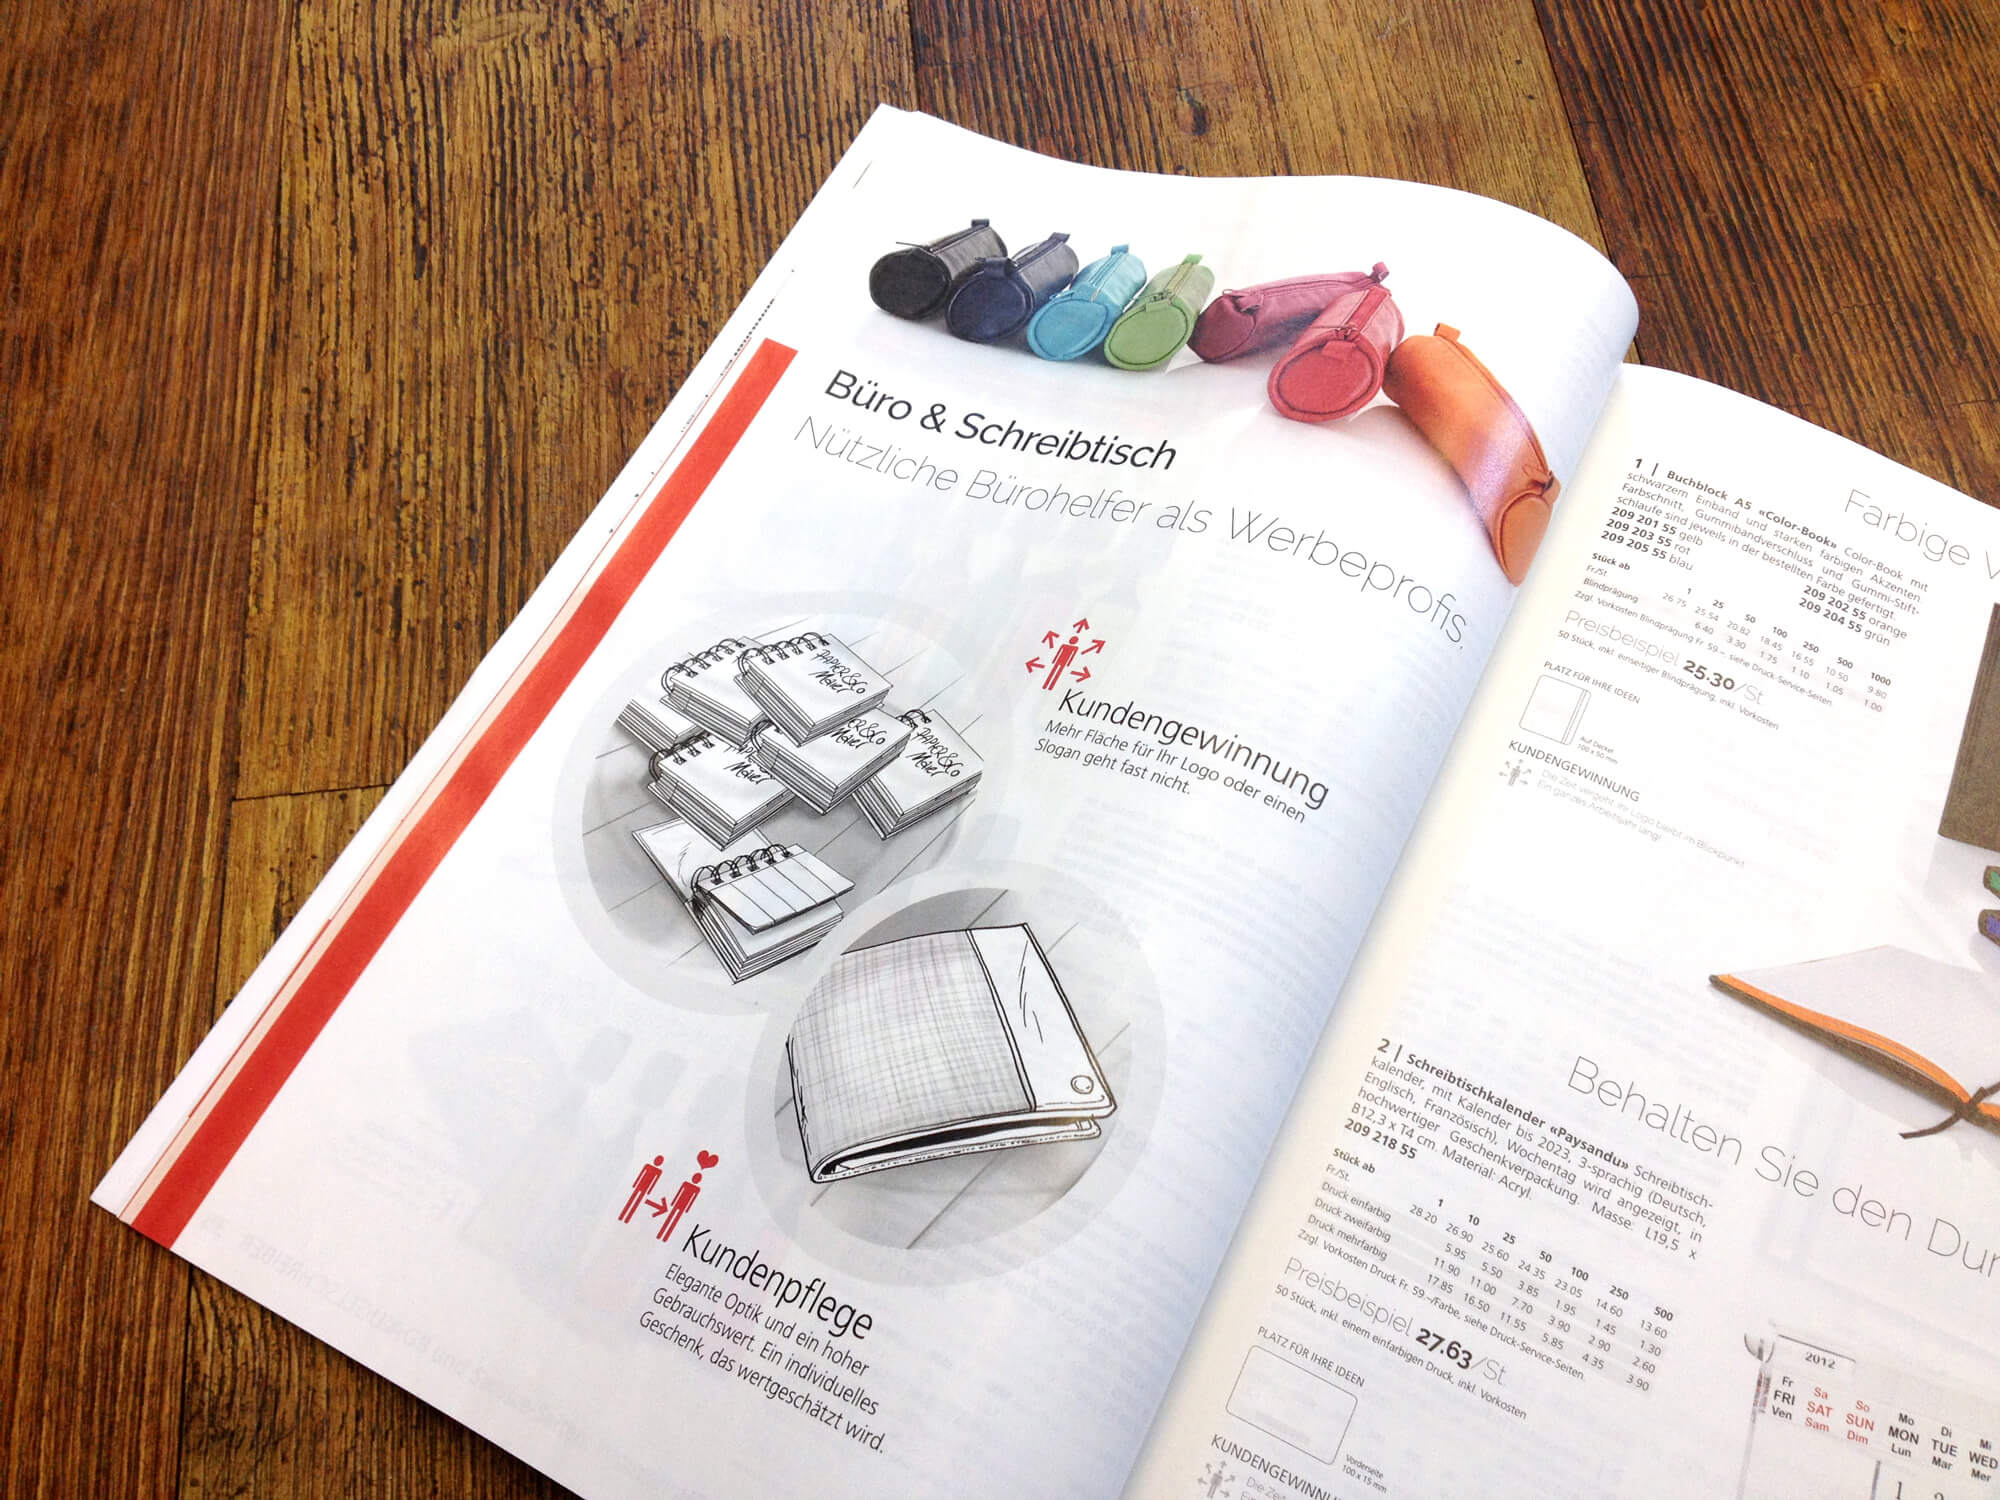 Hach Katalog Herbst 2015 Bzweic